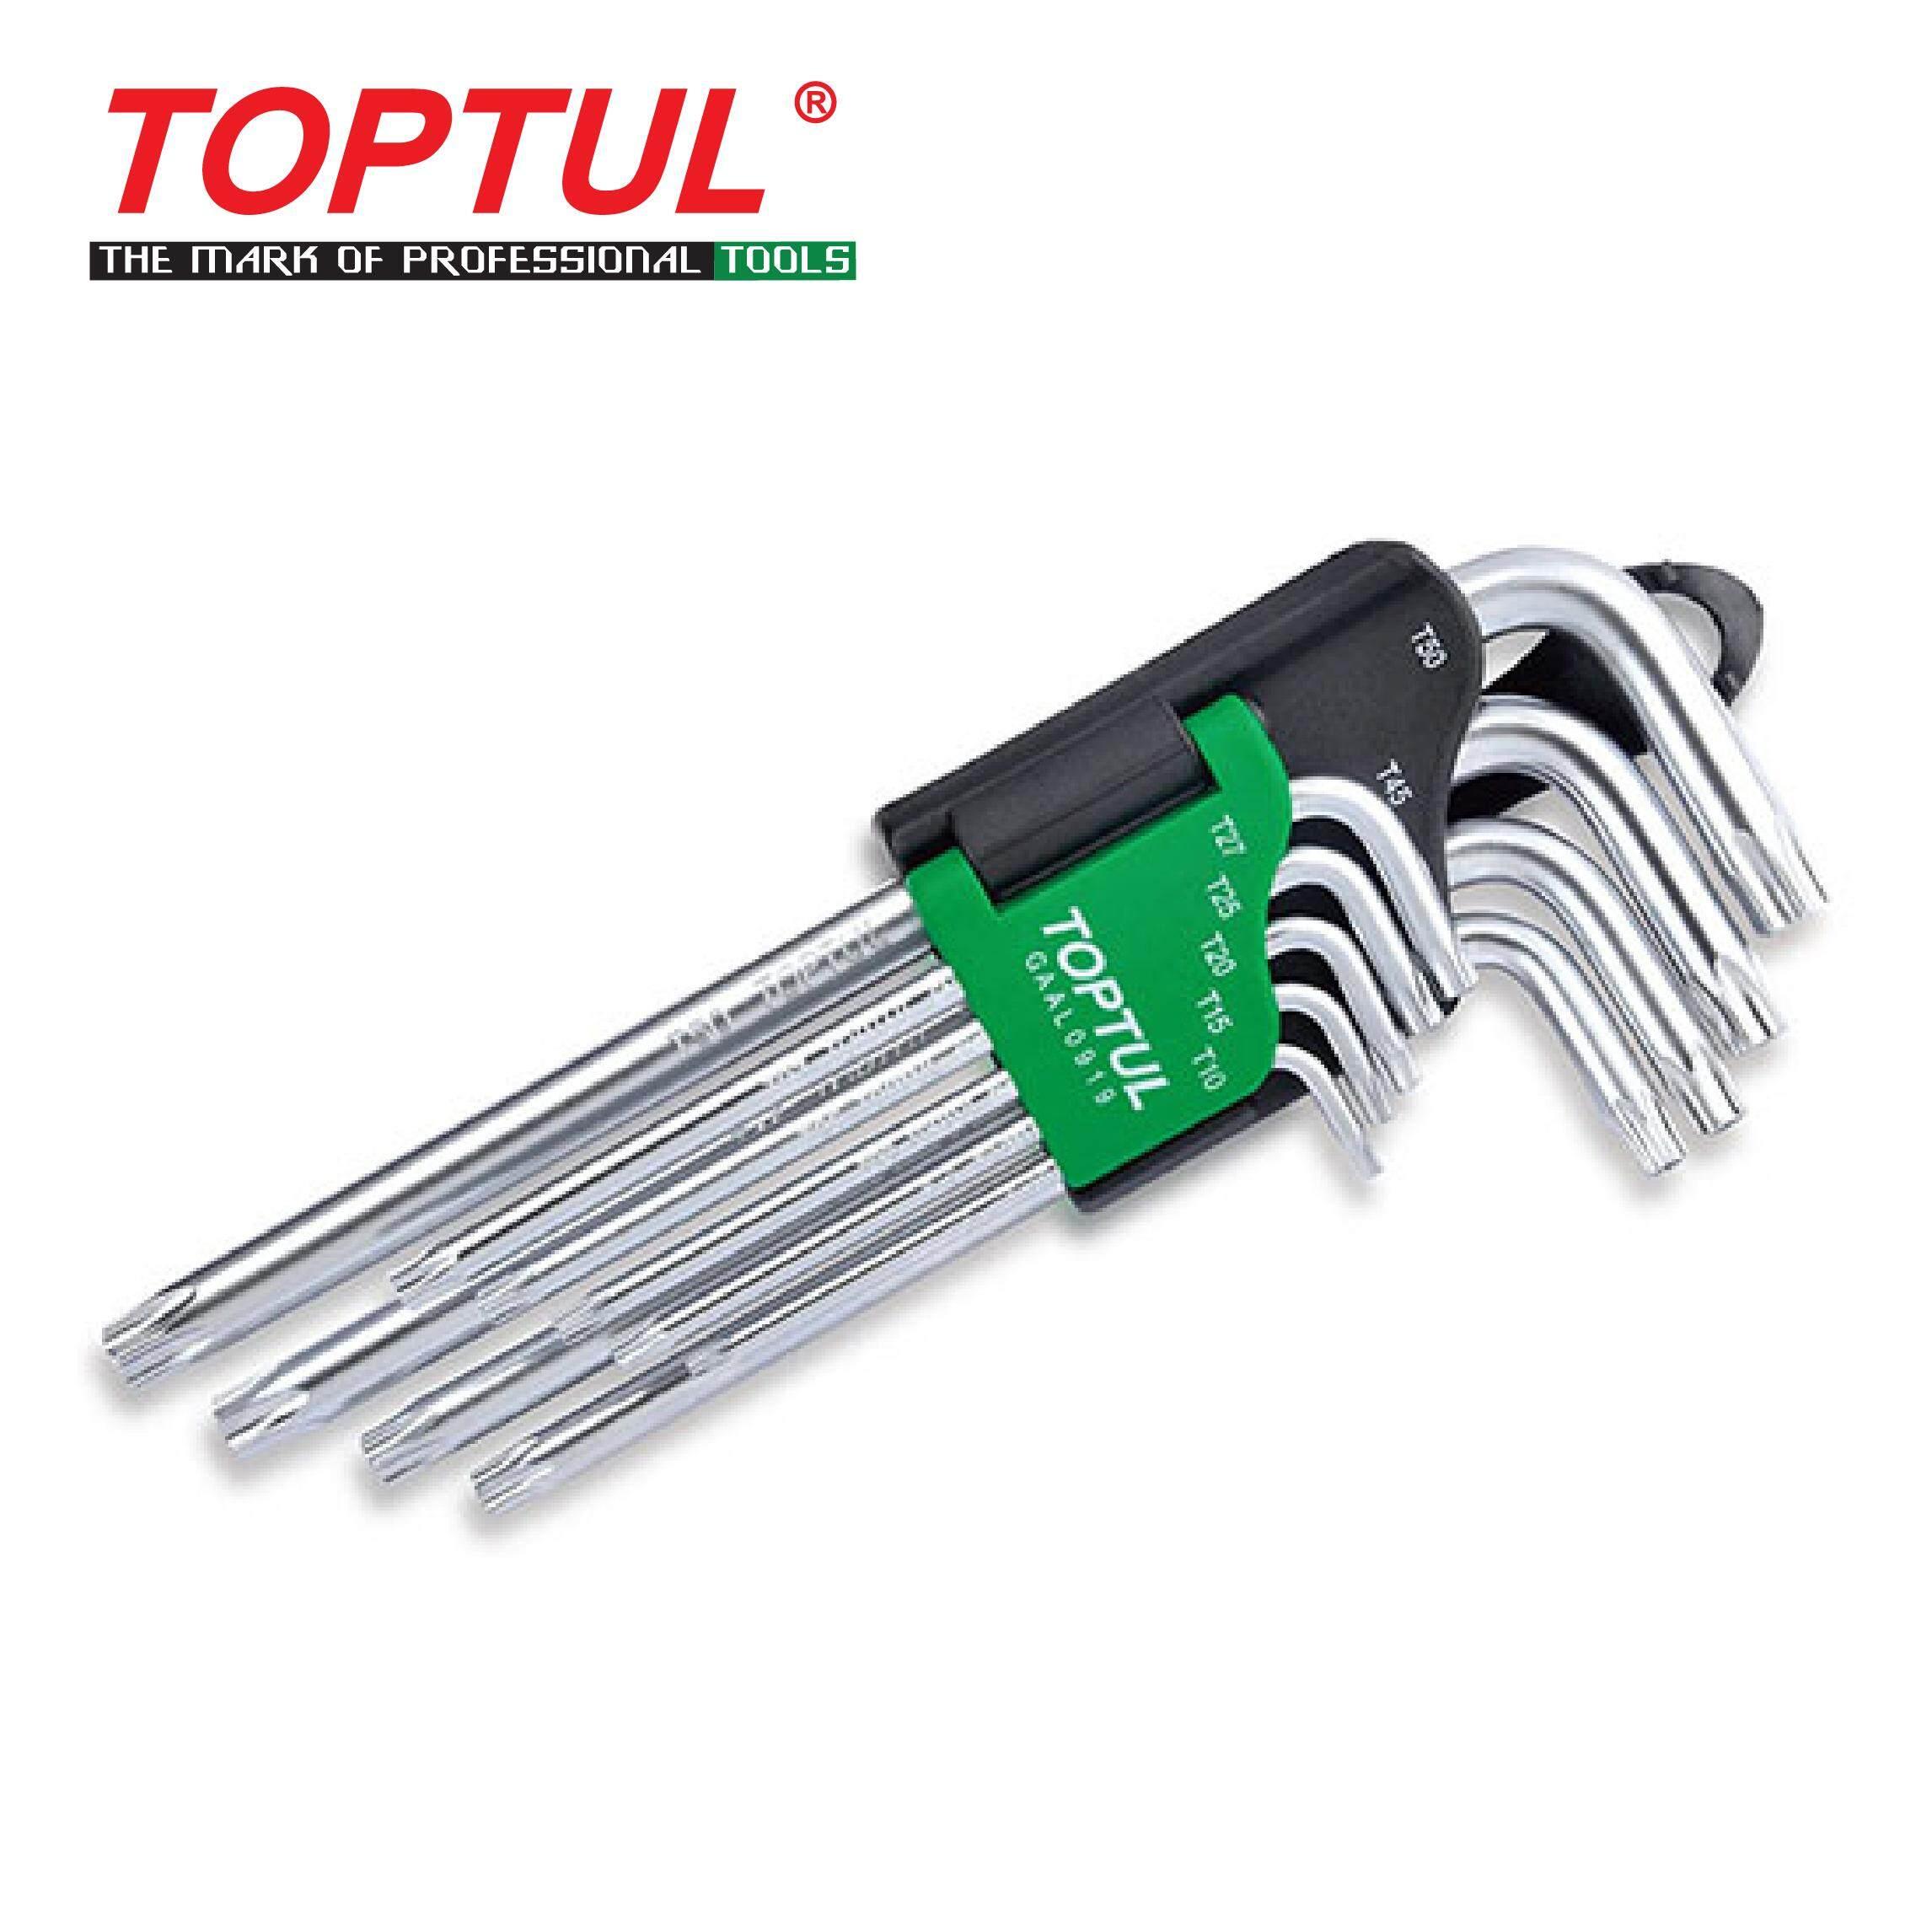 TOPTUL 9PCS Long Type Star Tamperproof Key Wrench Set (GAAL0919)